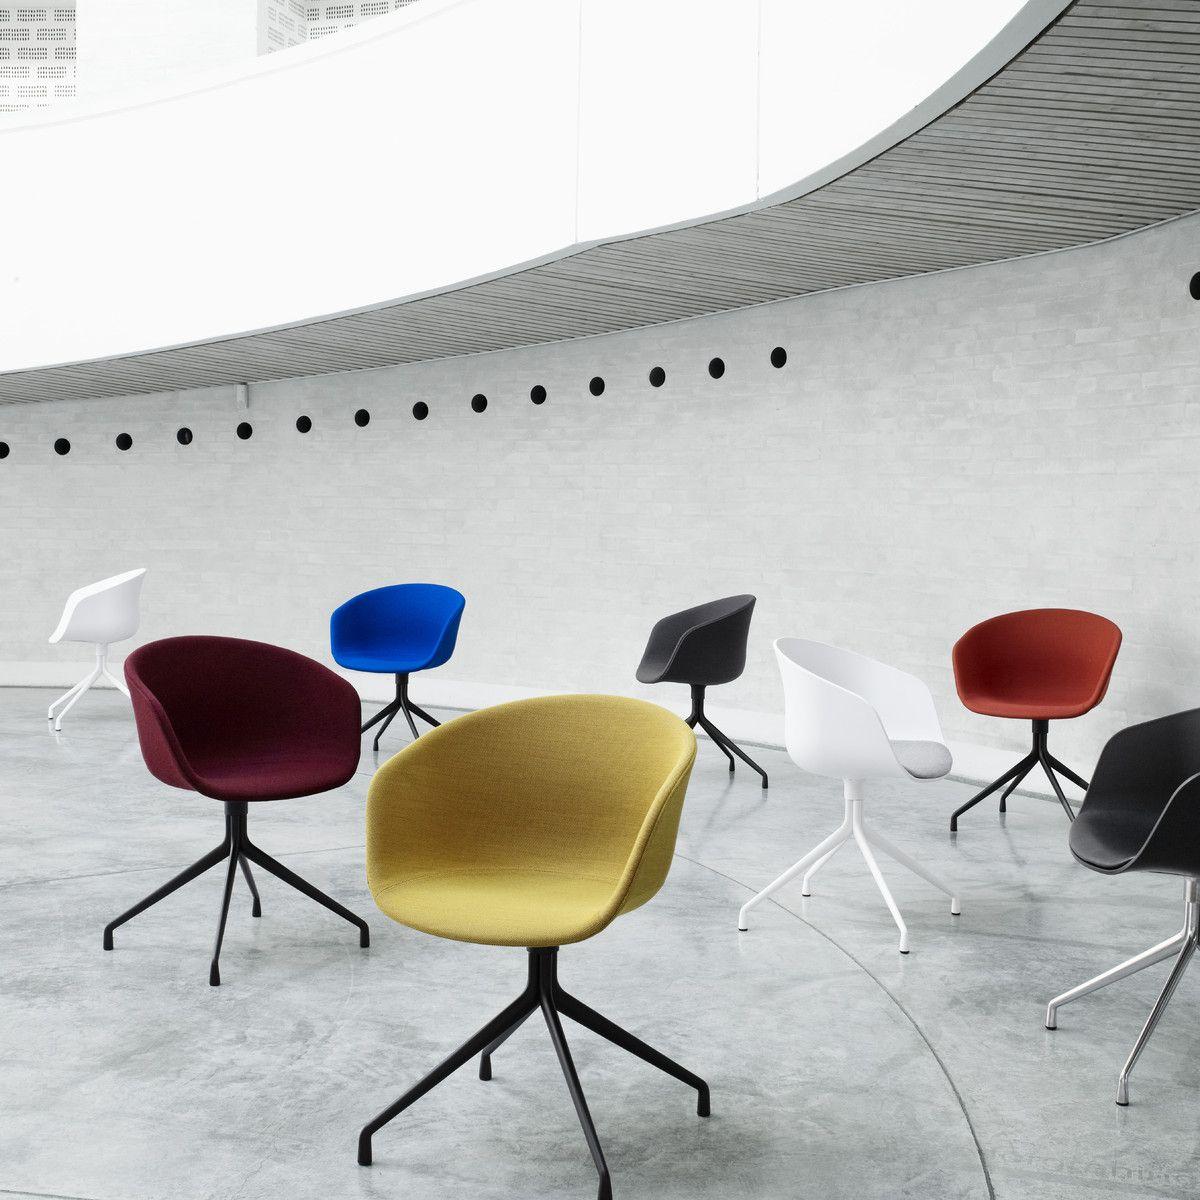 office chair conference dining scandinavian design aac22. Abbildung Hay - About A Chair AAC 20...love This Style Of Desk Office Conference Dining Scandinavian Design Aac22